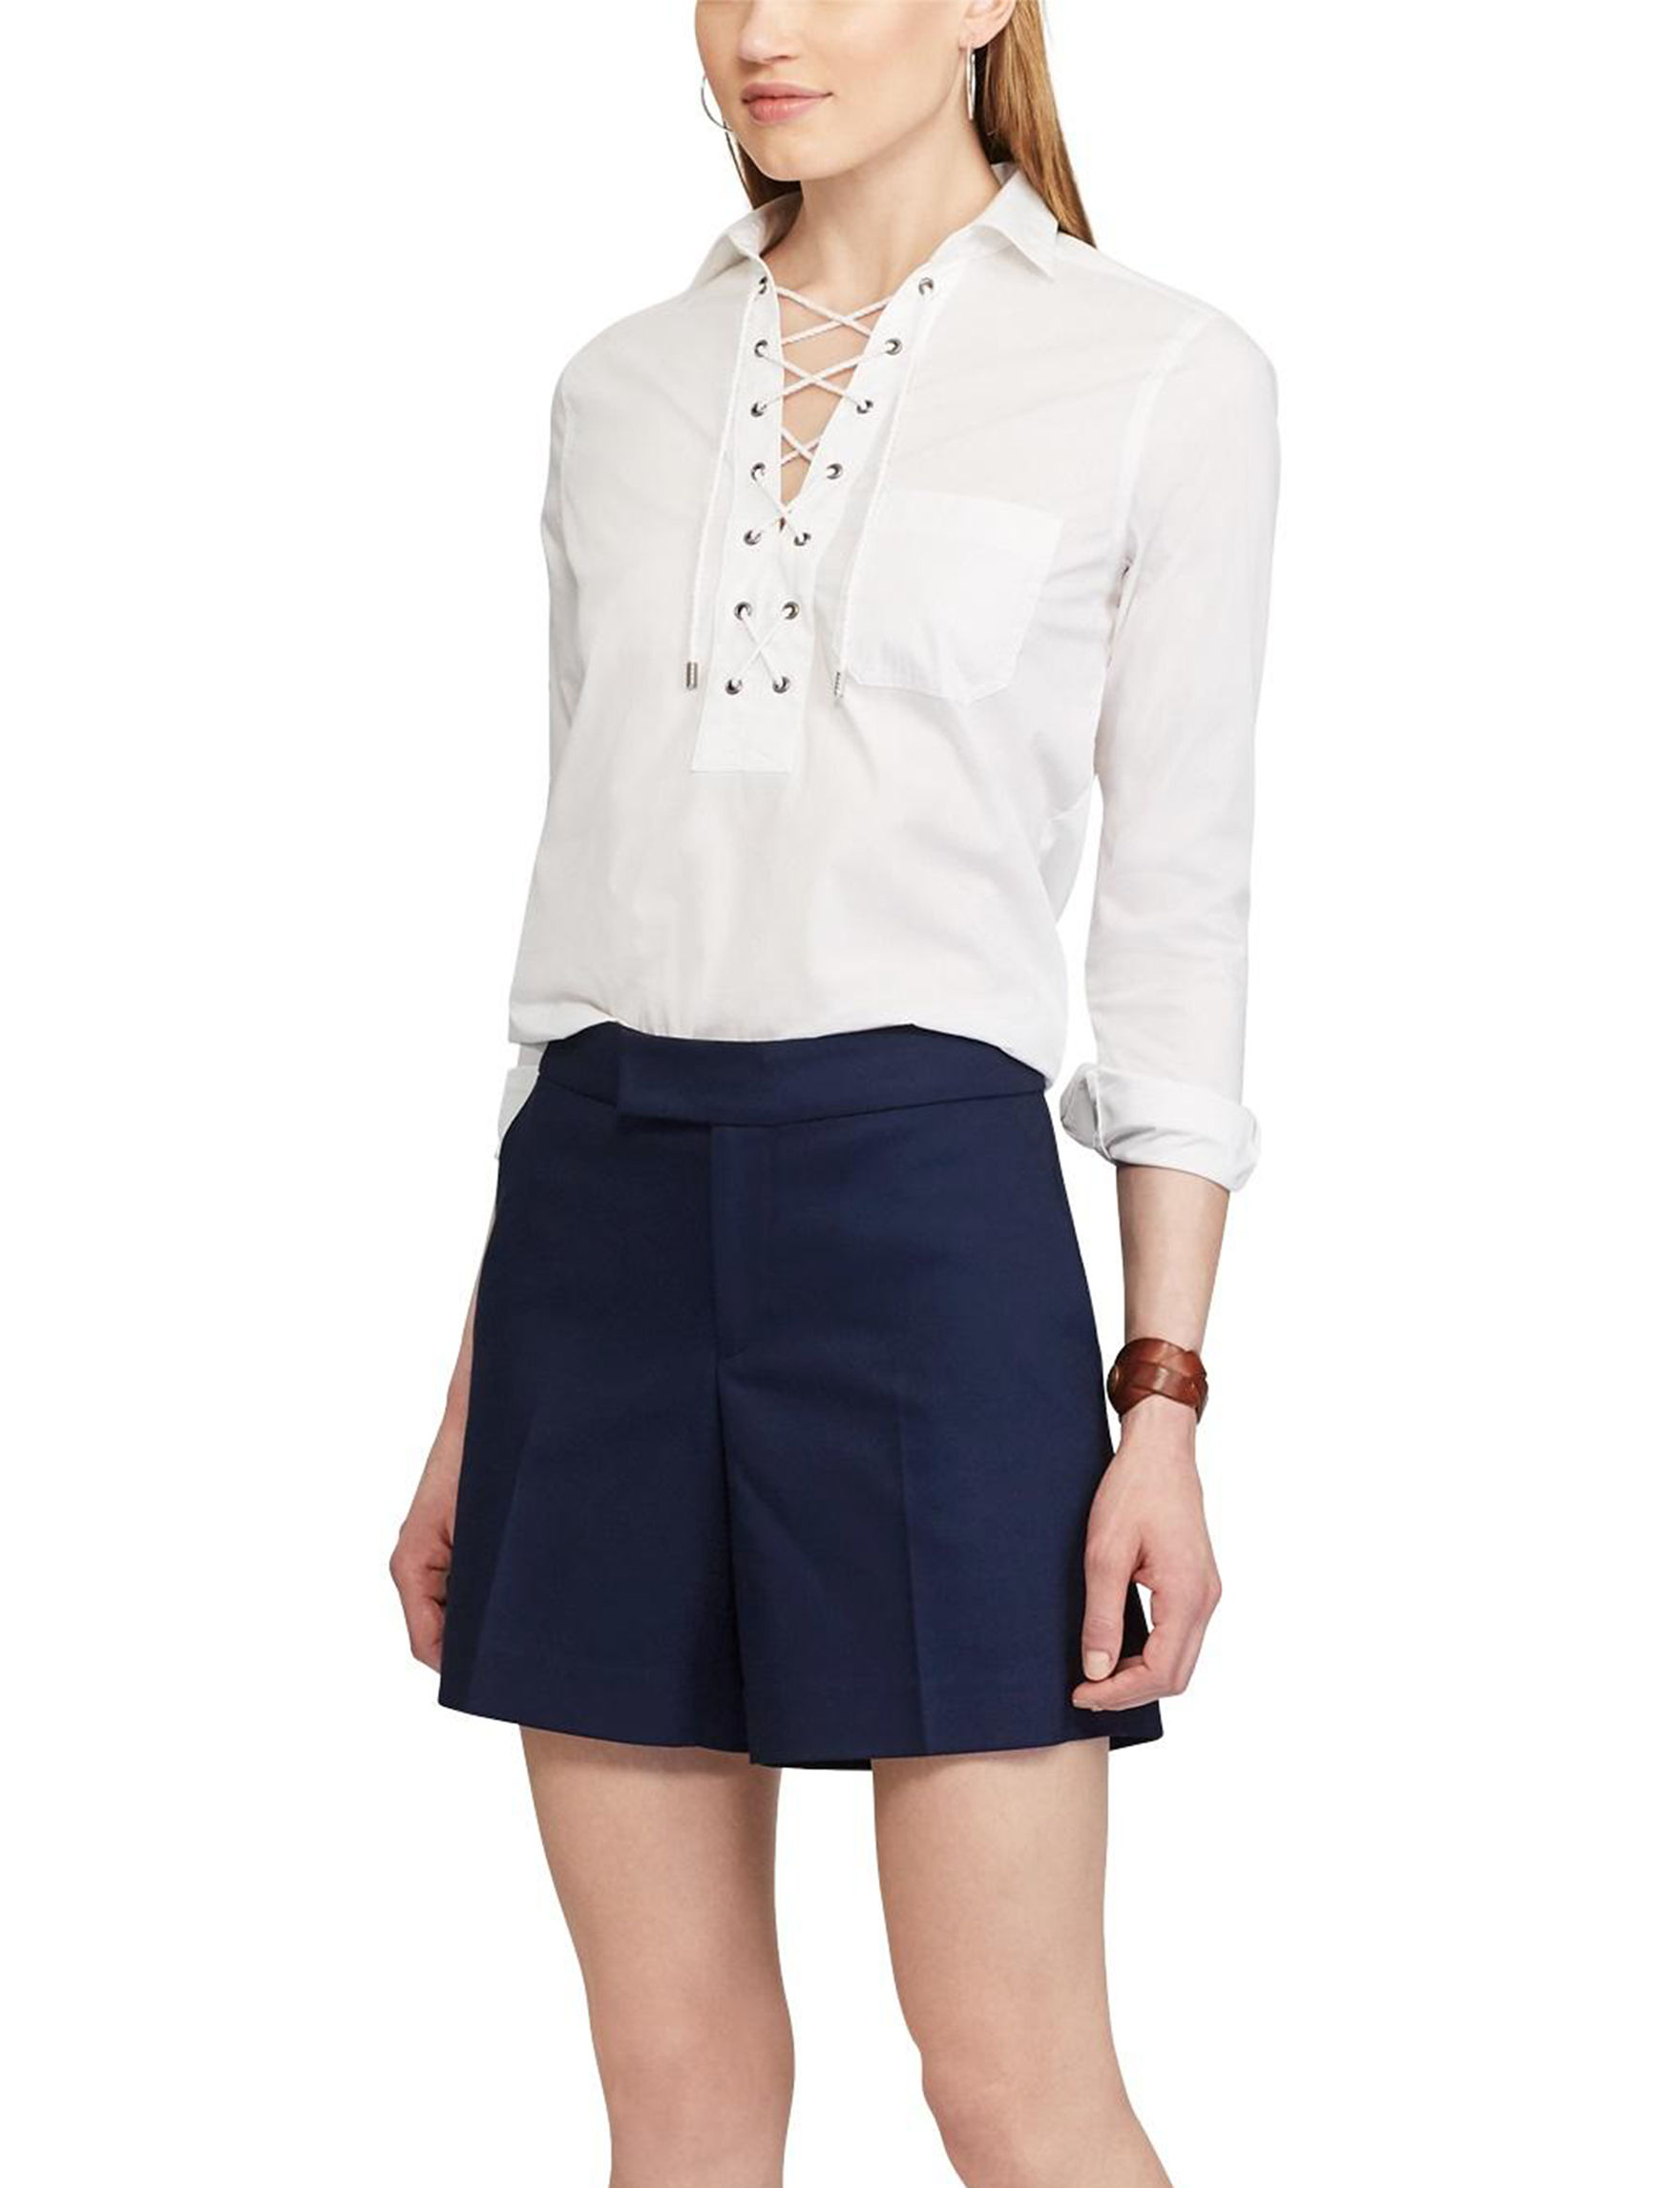 Chaps Navy Soft Shorts